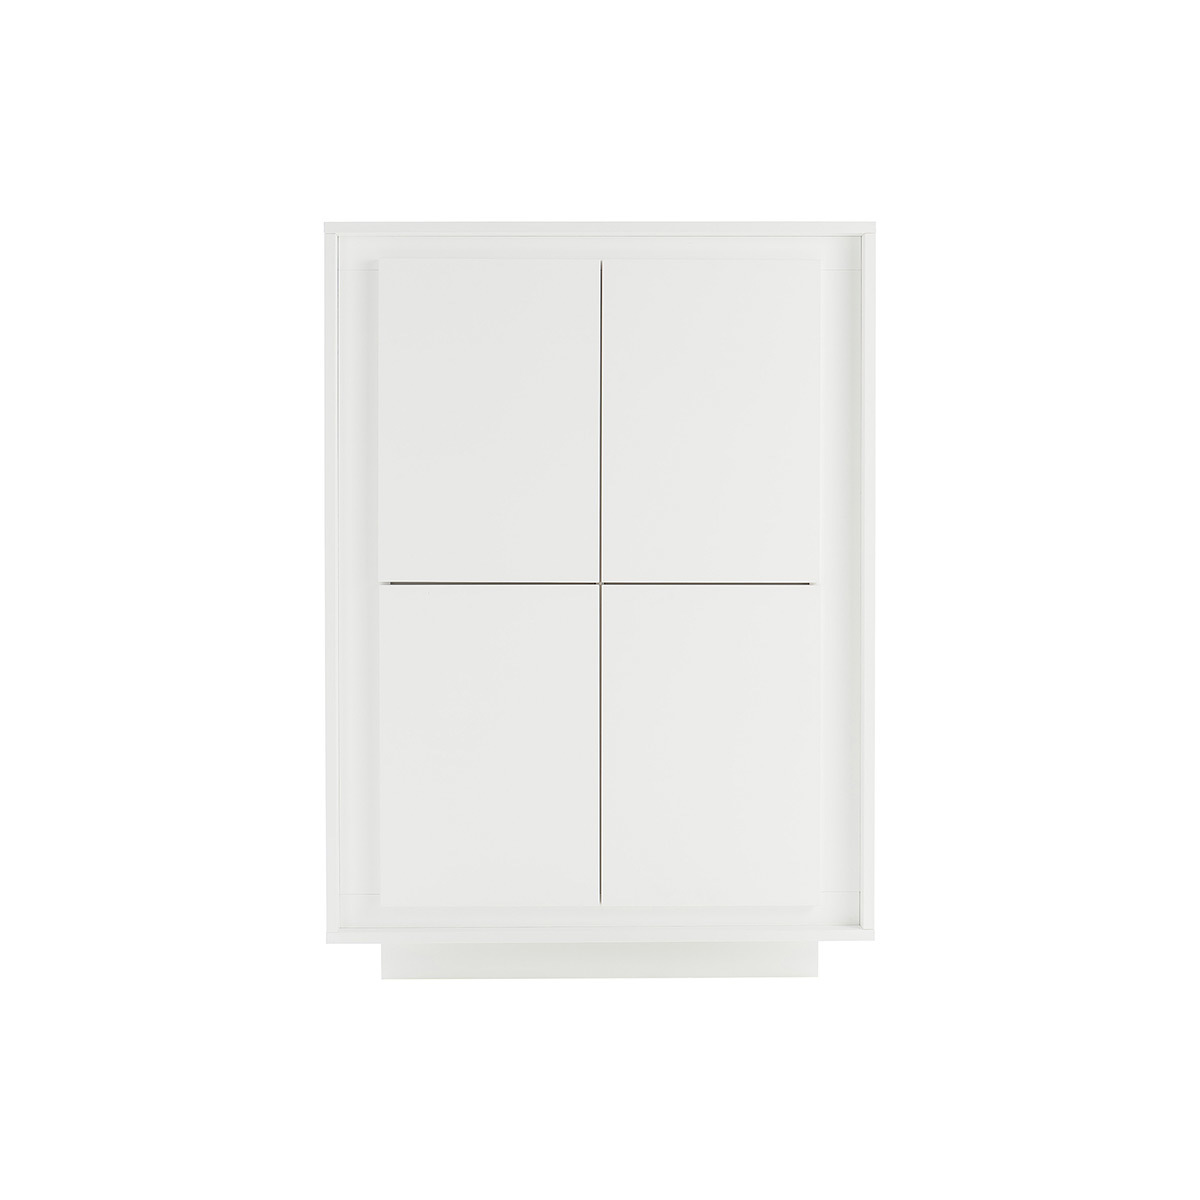 Mobiletto buffet alto design 4 porte color: Bianco LAND